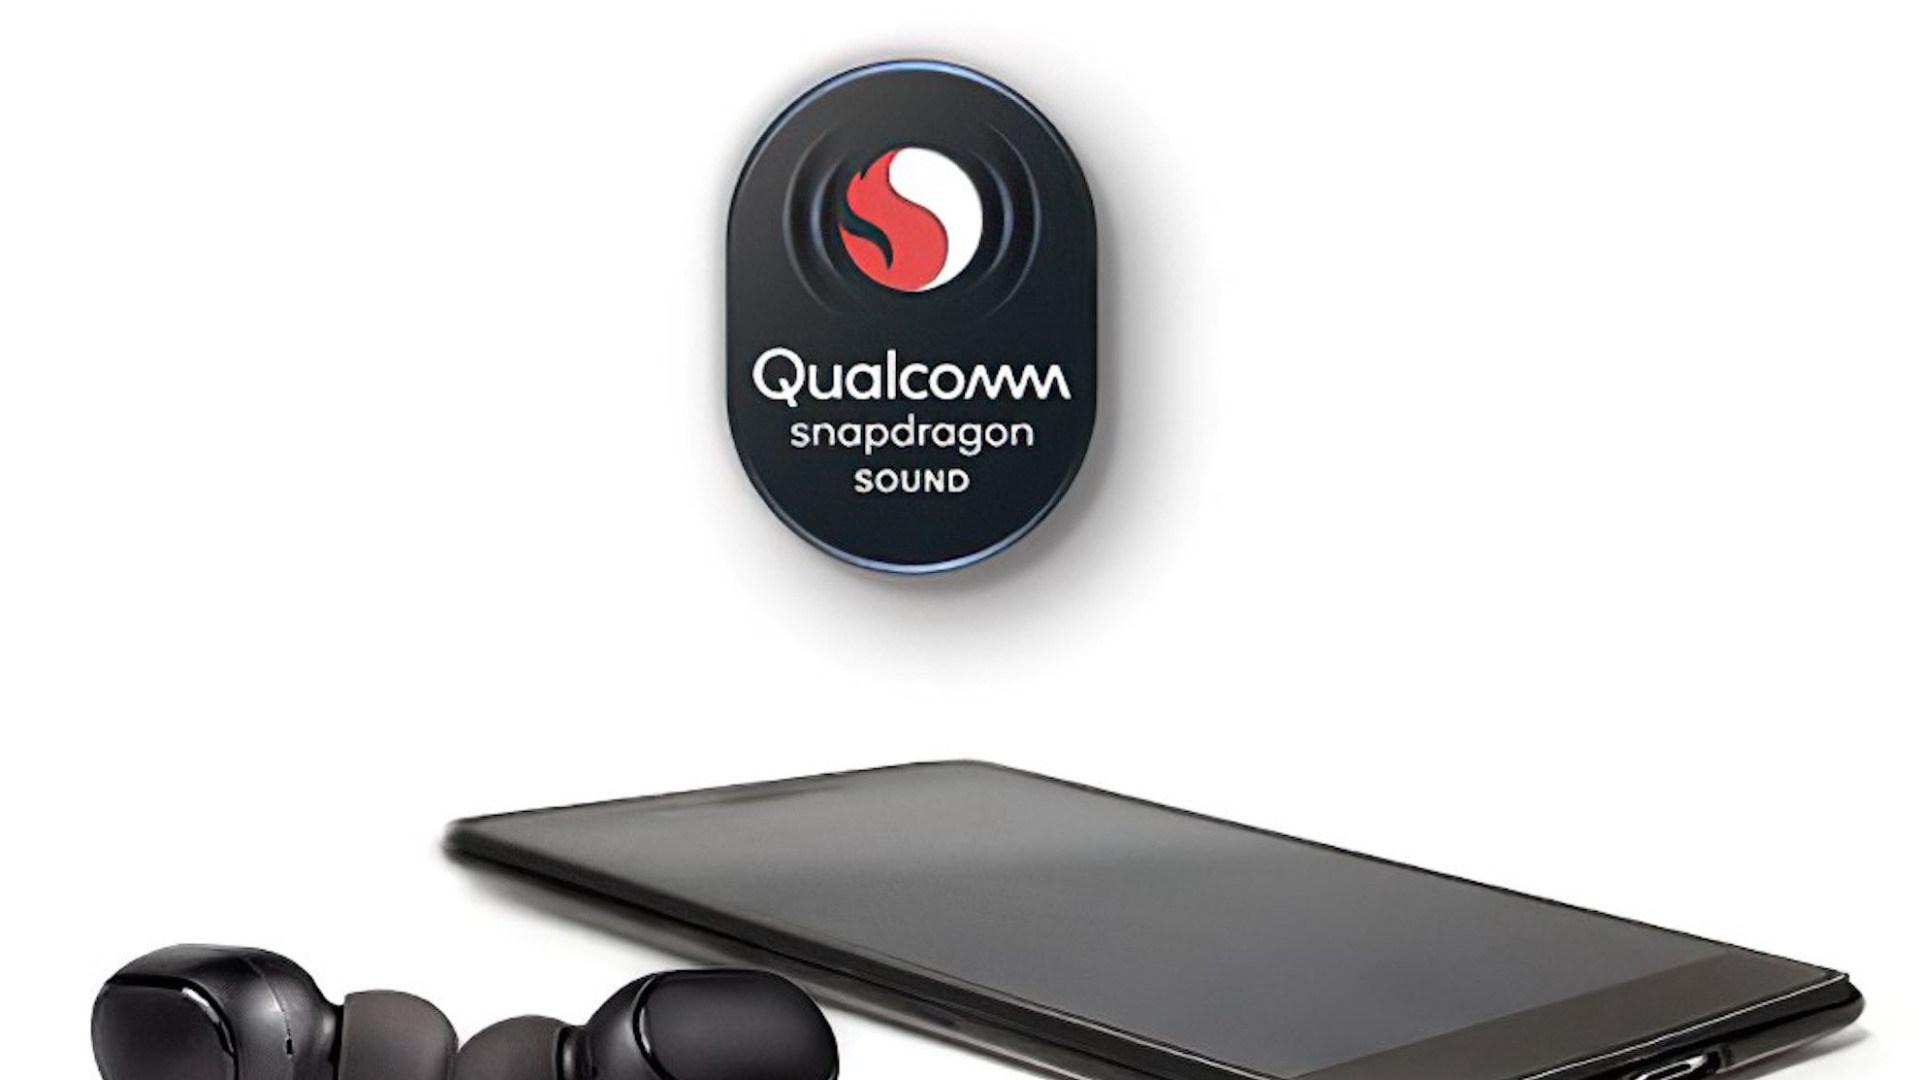 Qualcomm, Audio, Snapdragon, Snapdragon Sound